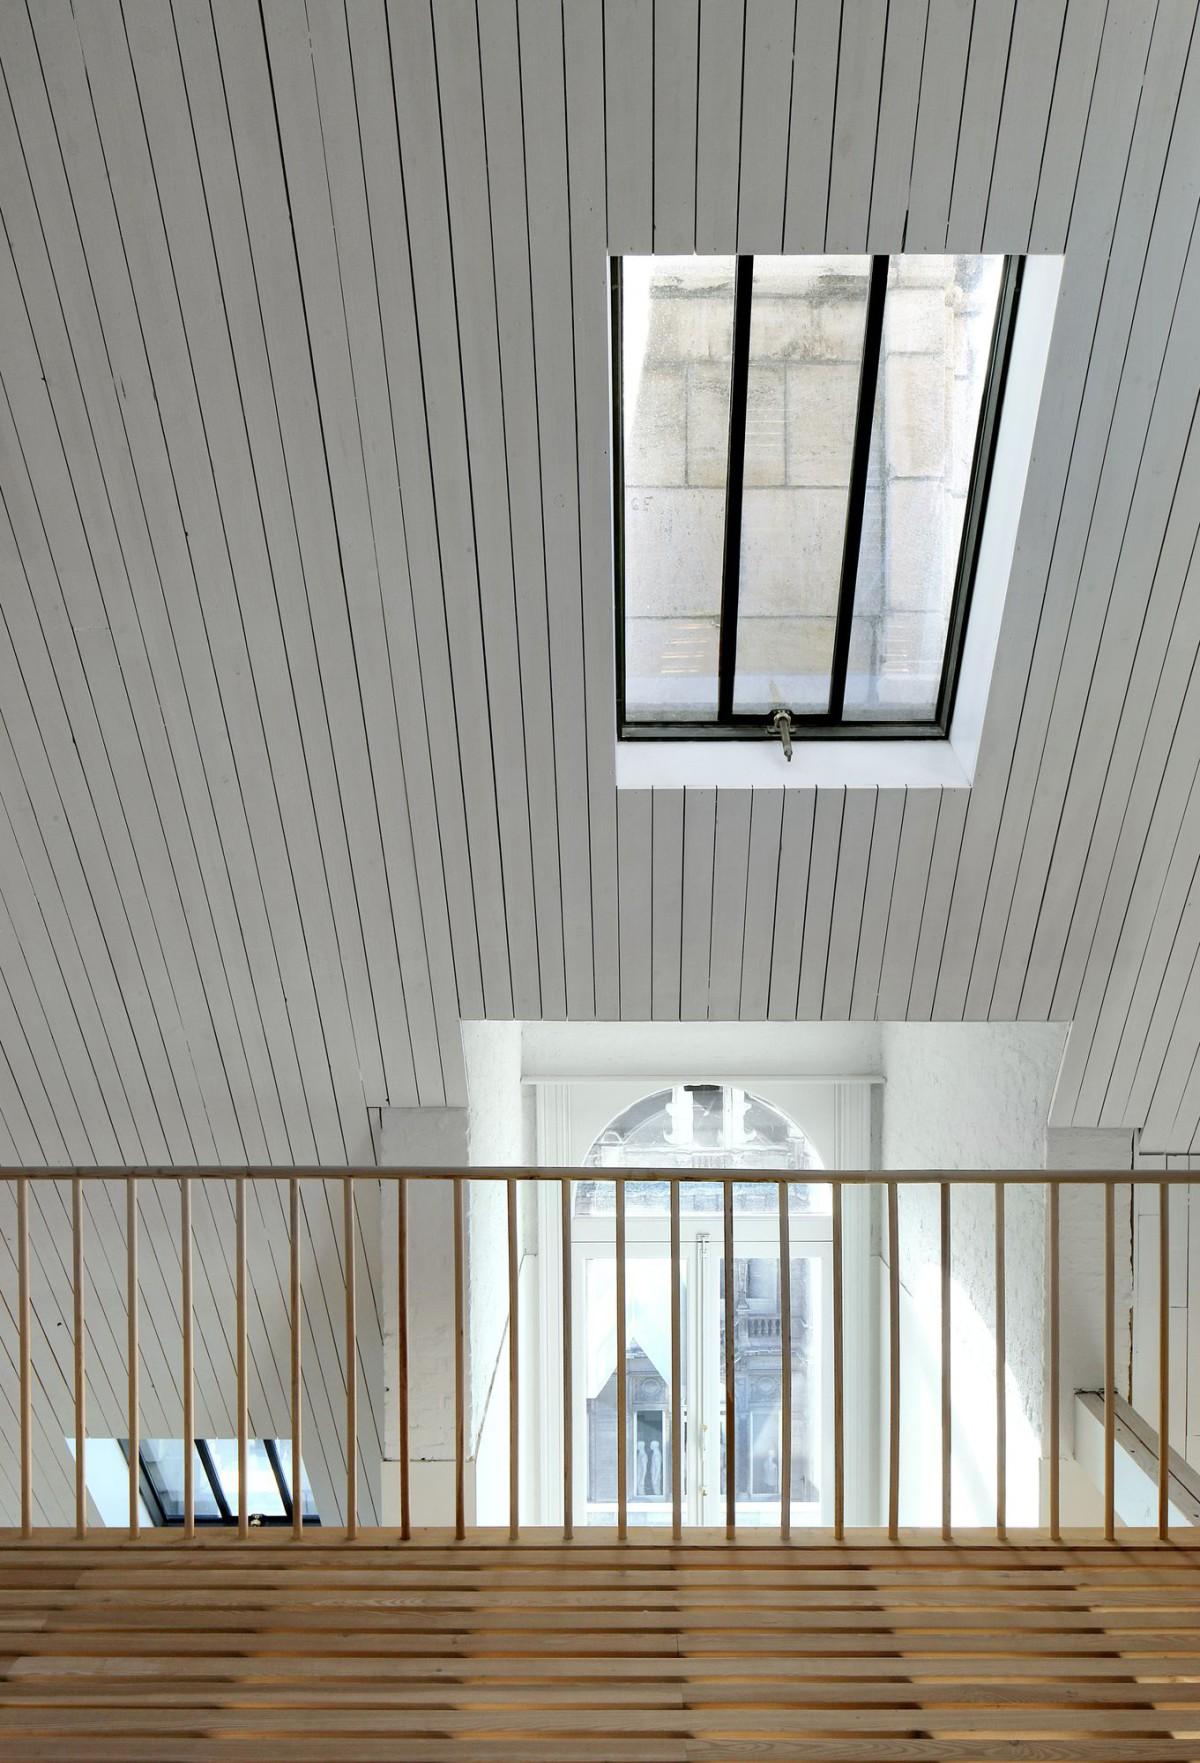 Bovenbouw Architectuur . Refurbishment of 3 historical buildings . Antwerp (24)